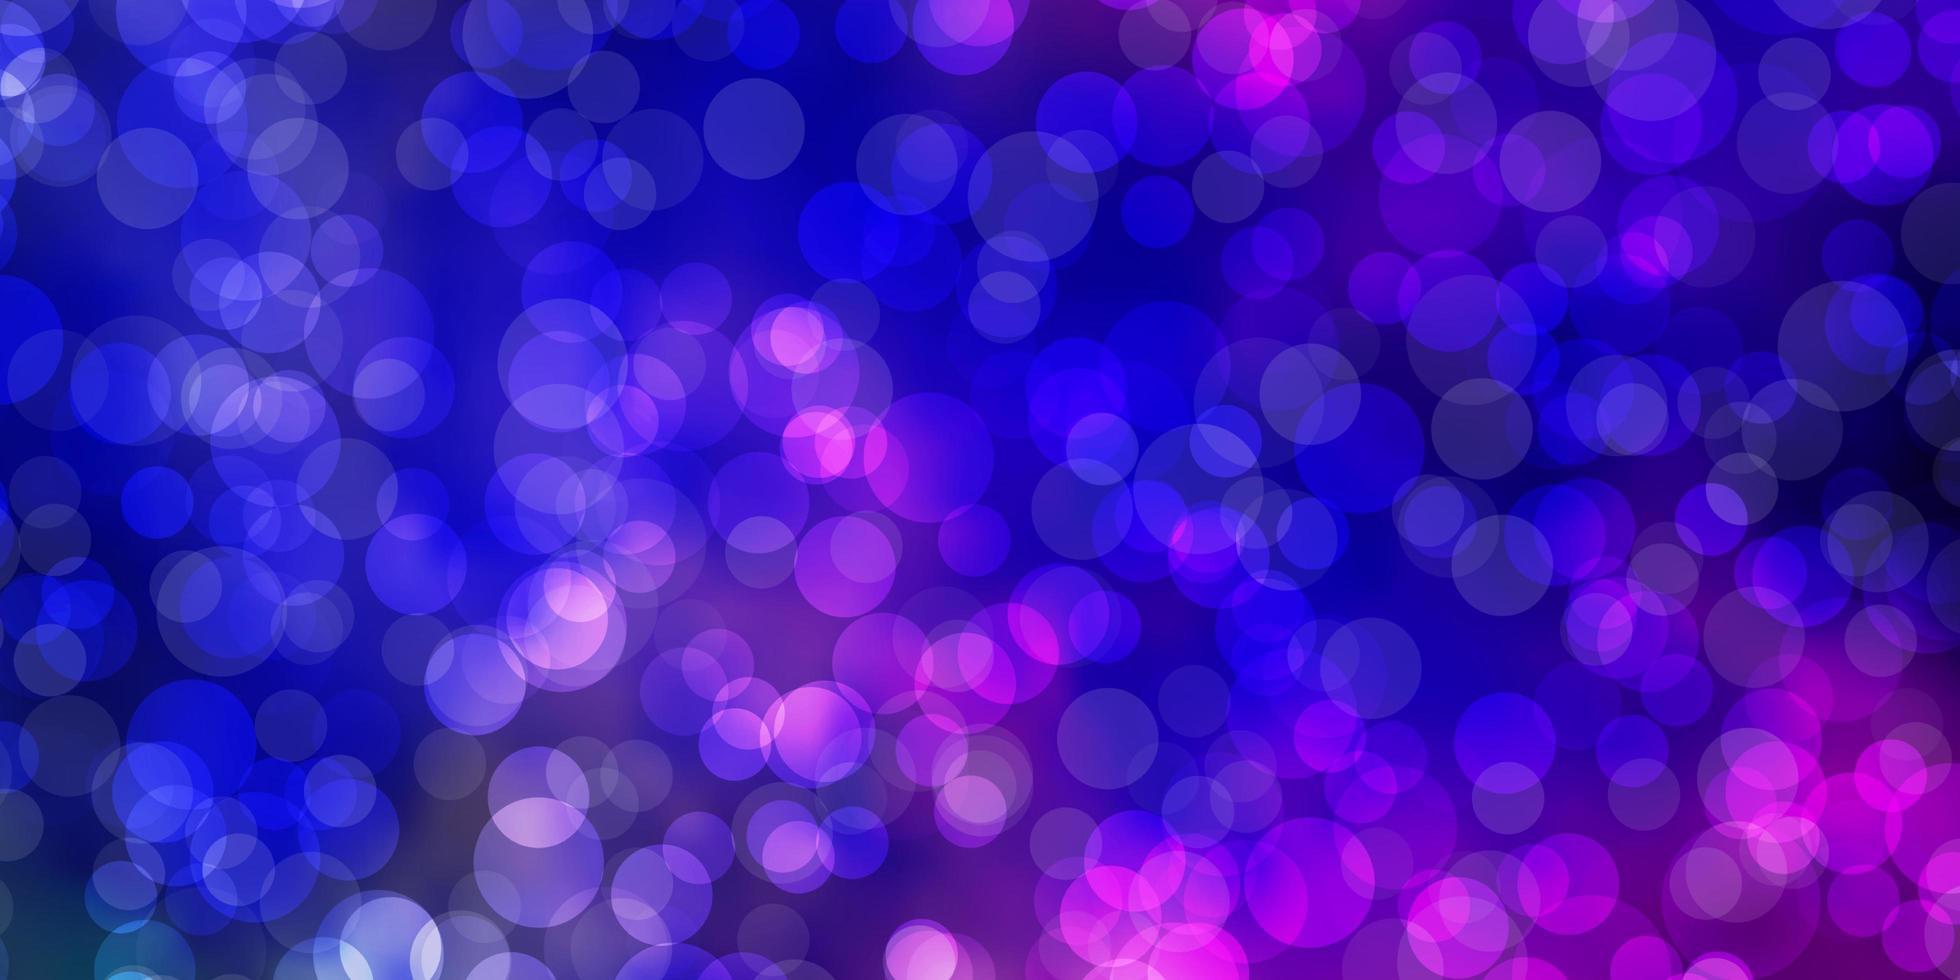 Fondo de vector de color rosa claro, azul con manchas.